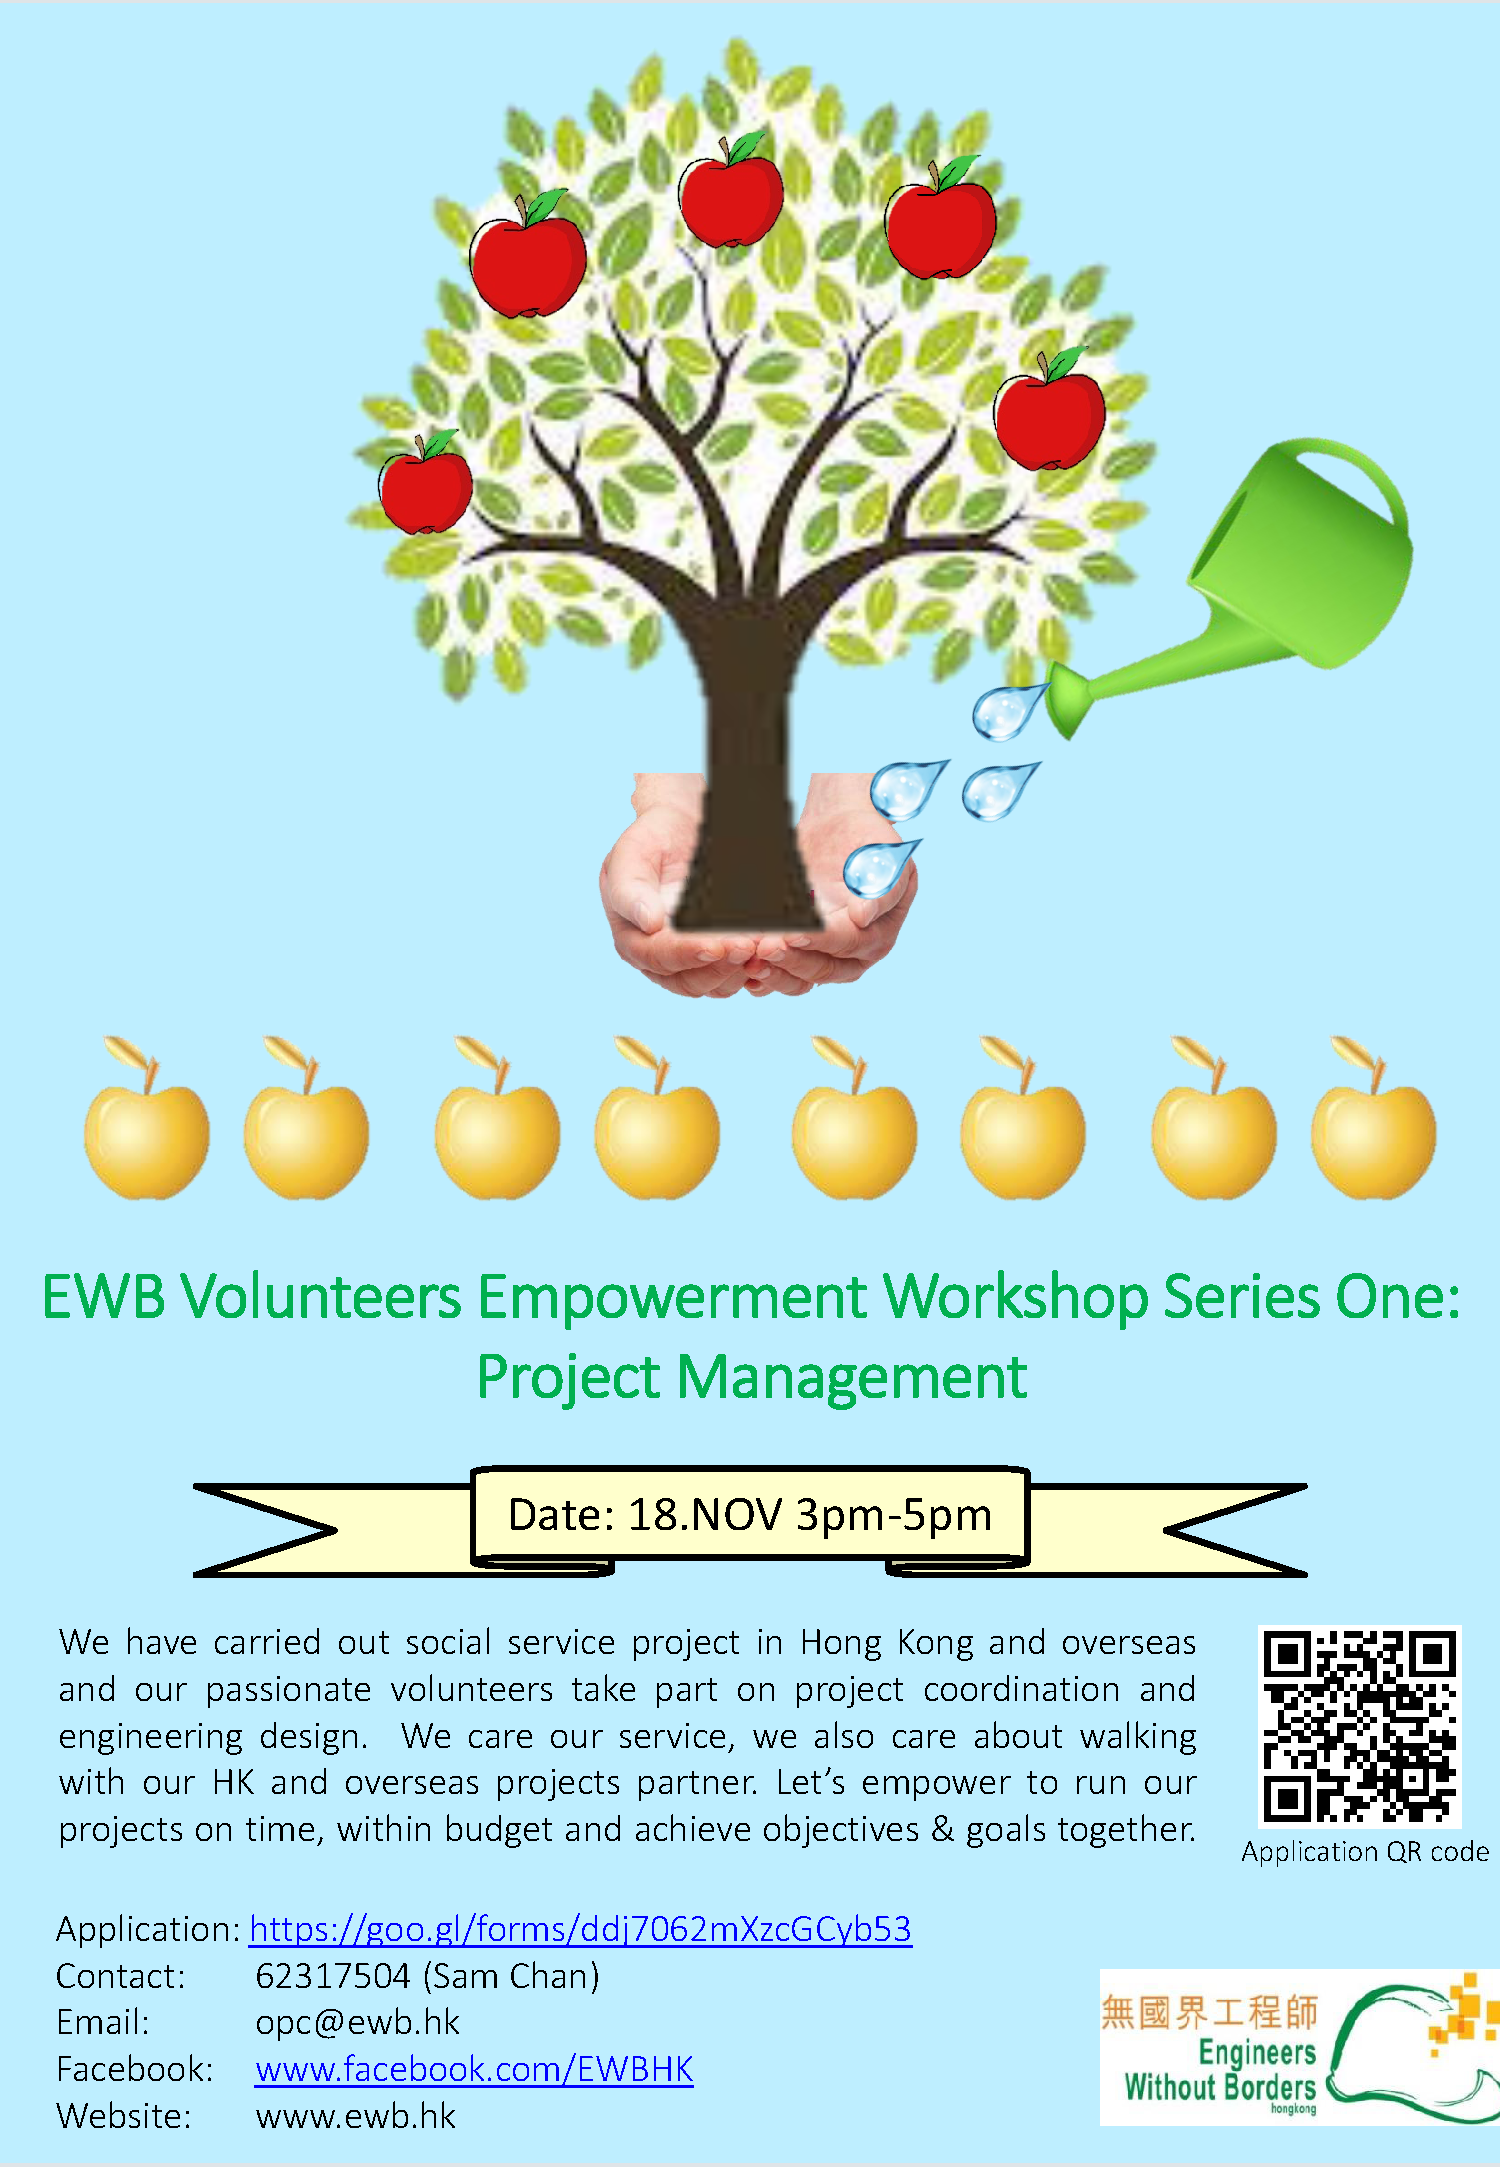 20181118 Volunteer Empowerment Workshop Series One - PM poster.png